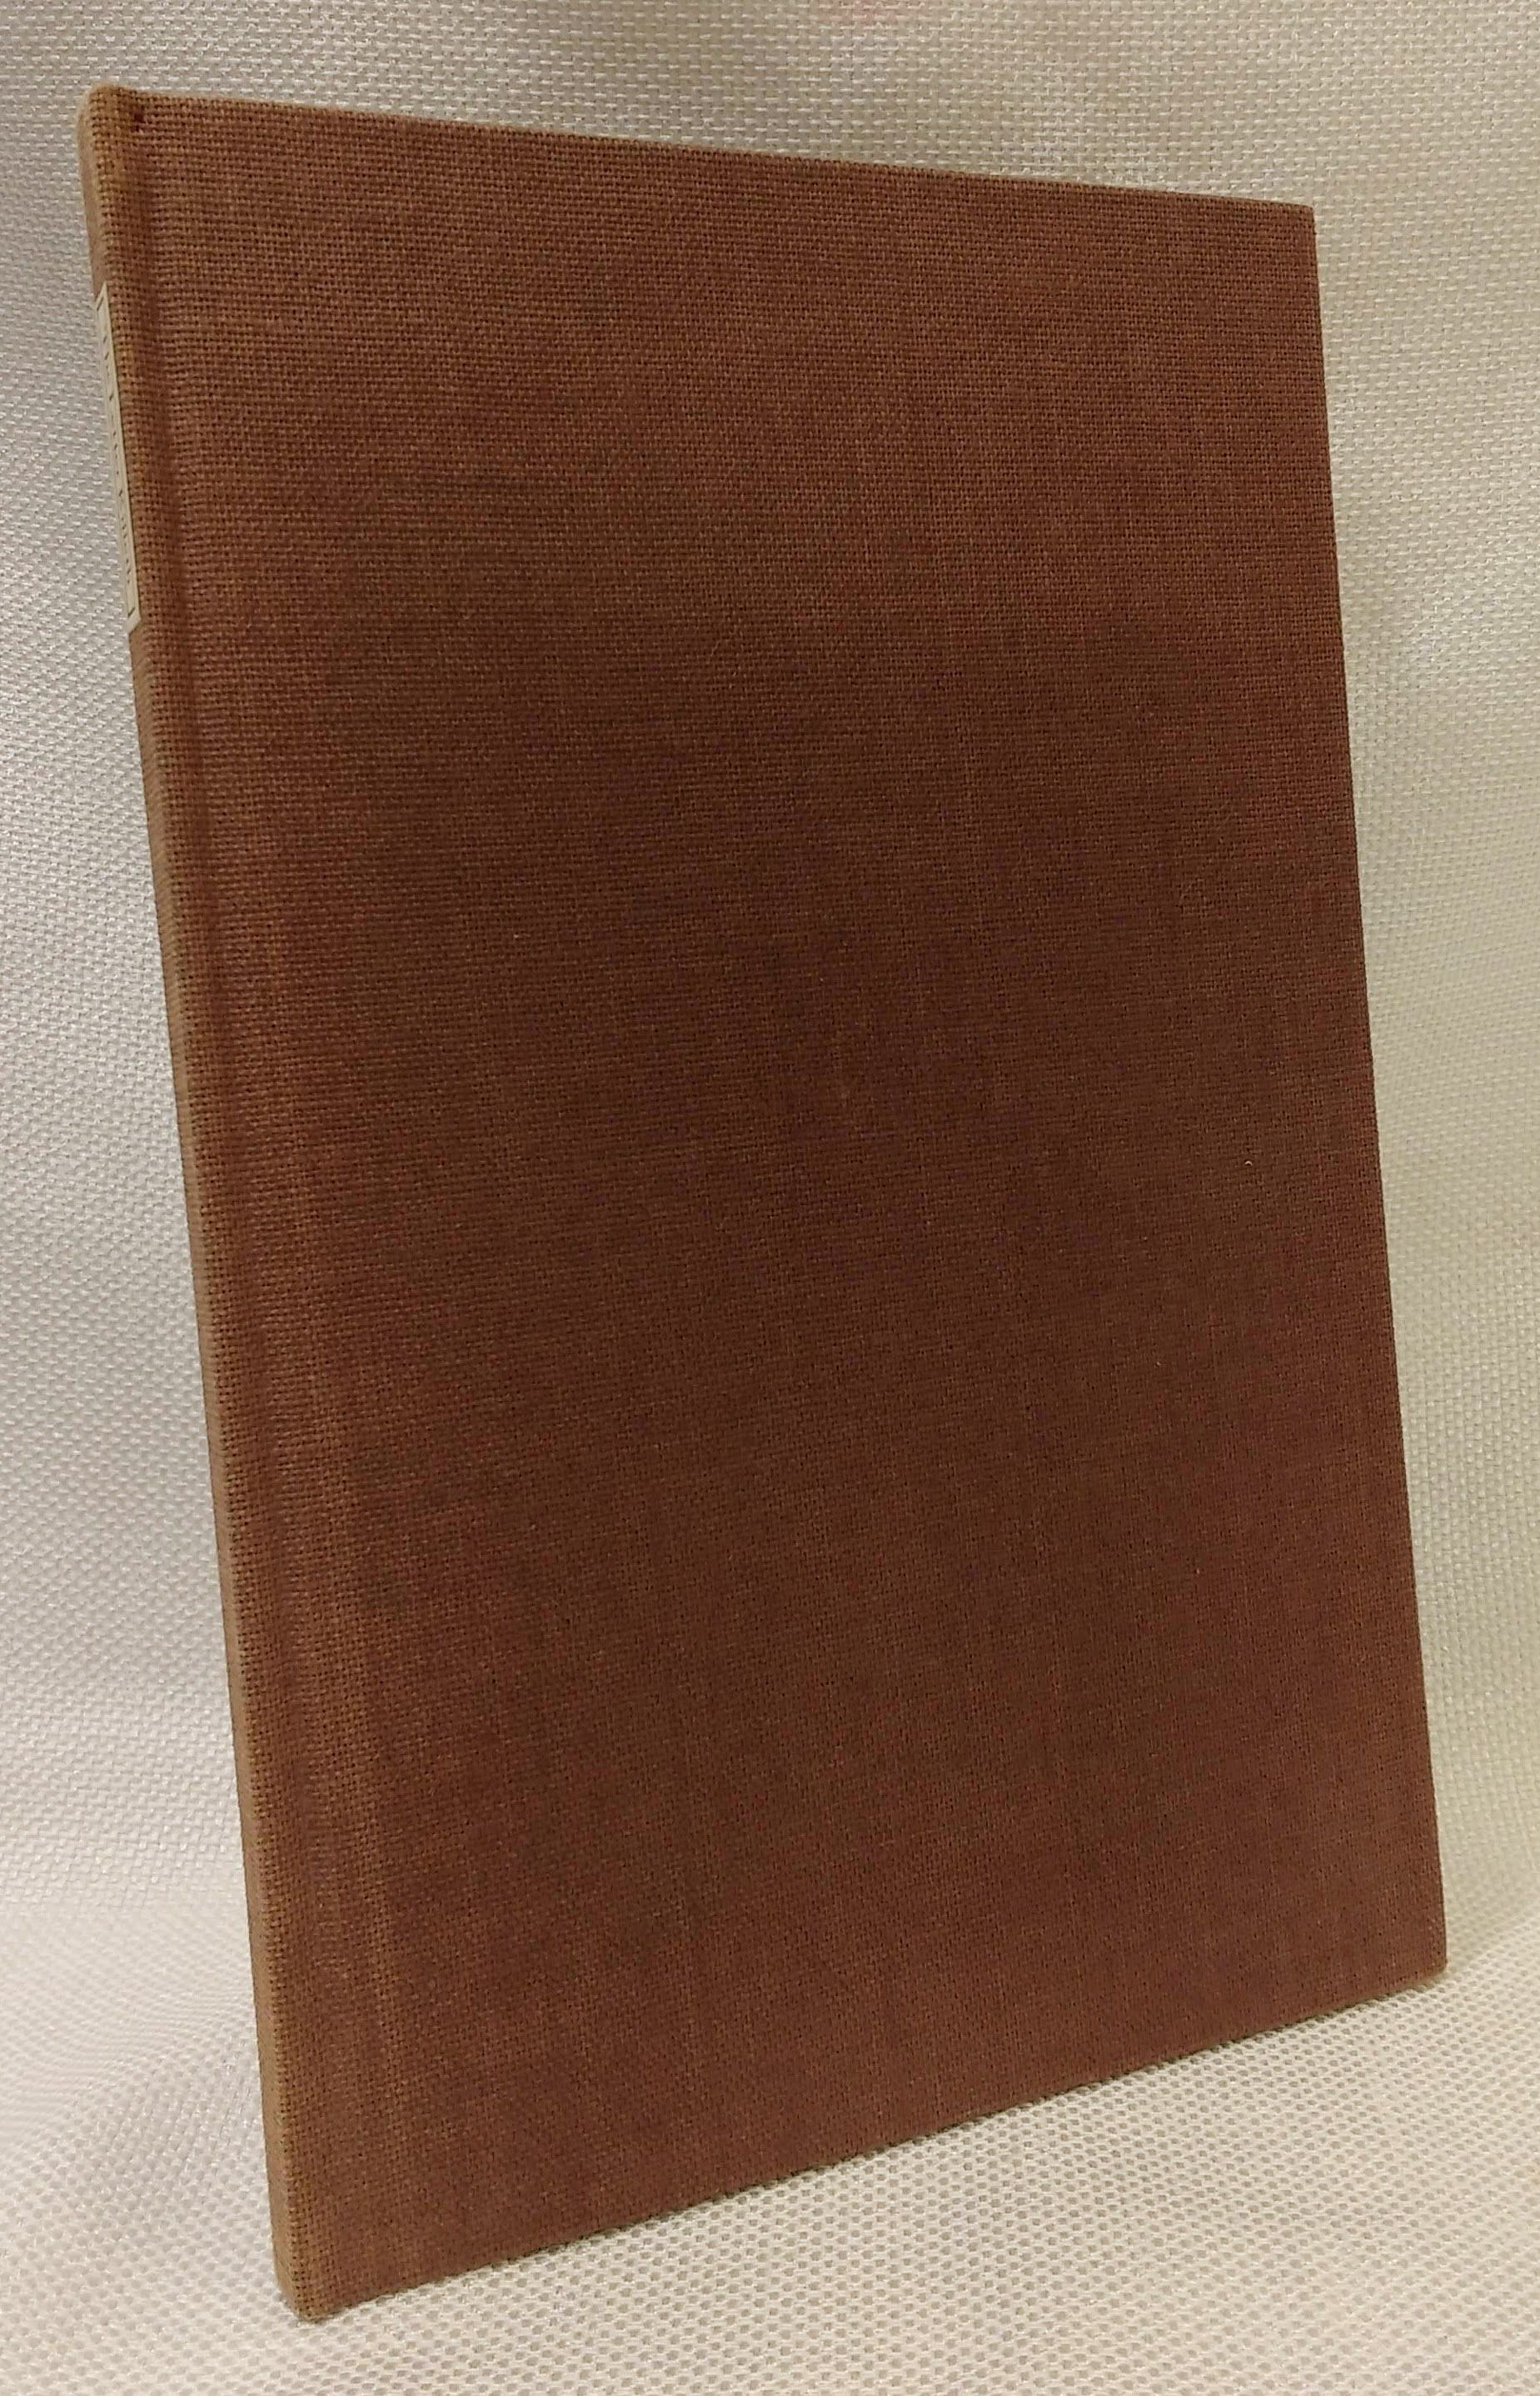 The Letter Killeth: Three Bibliographical Essays for Bibliomaniacs, Betty Rosenberg